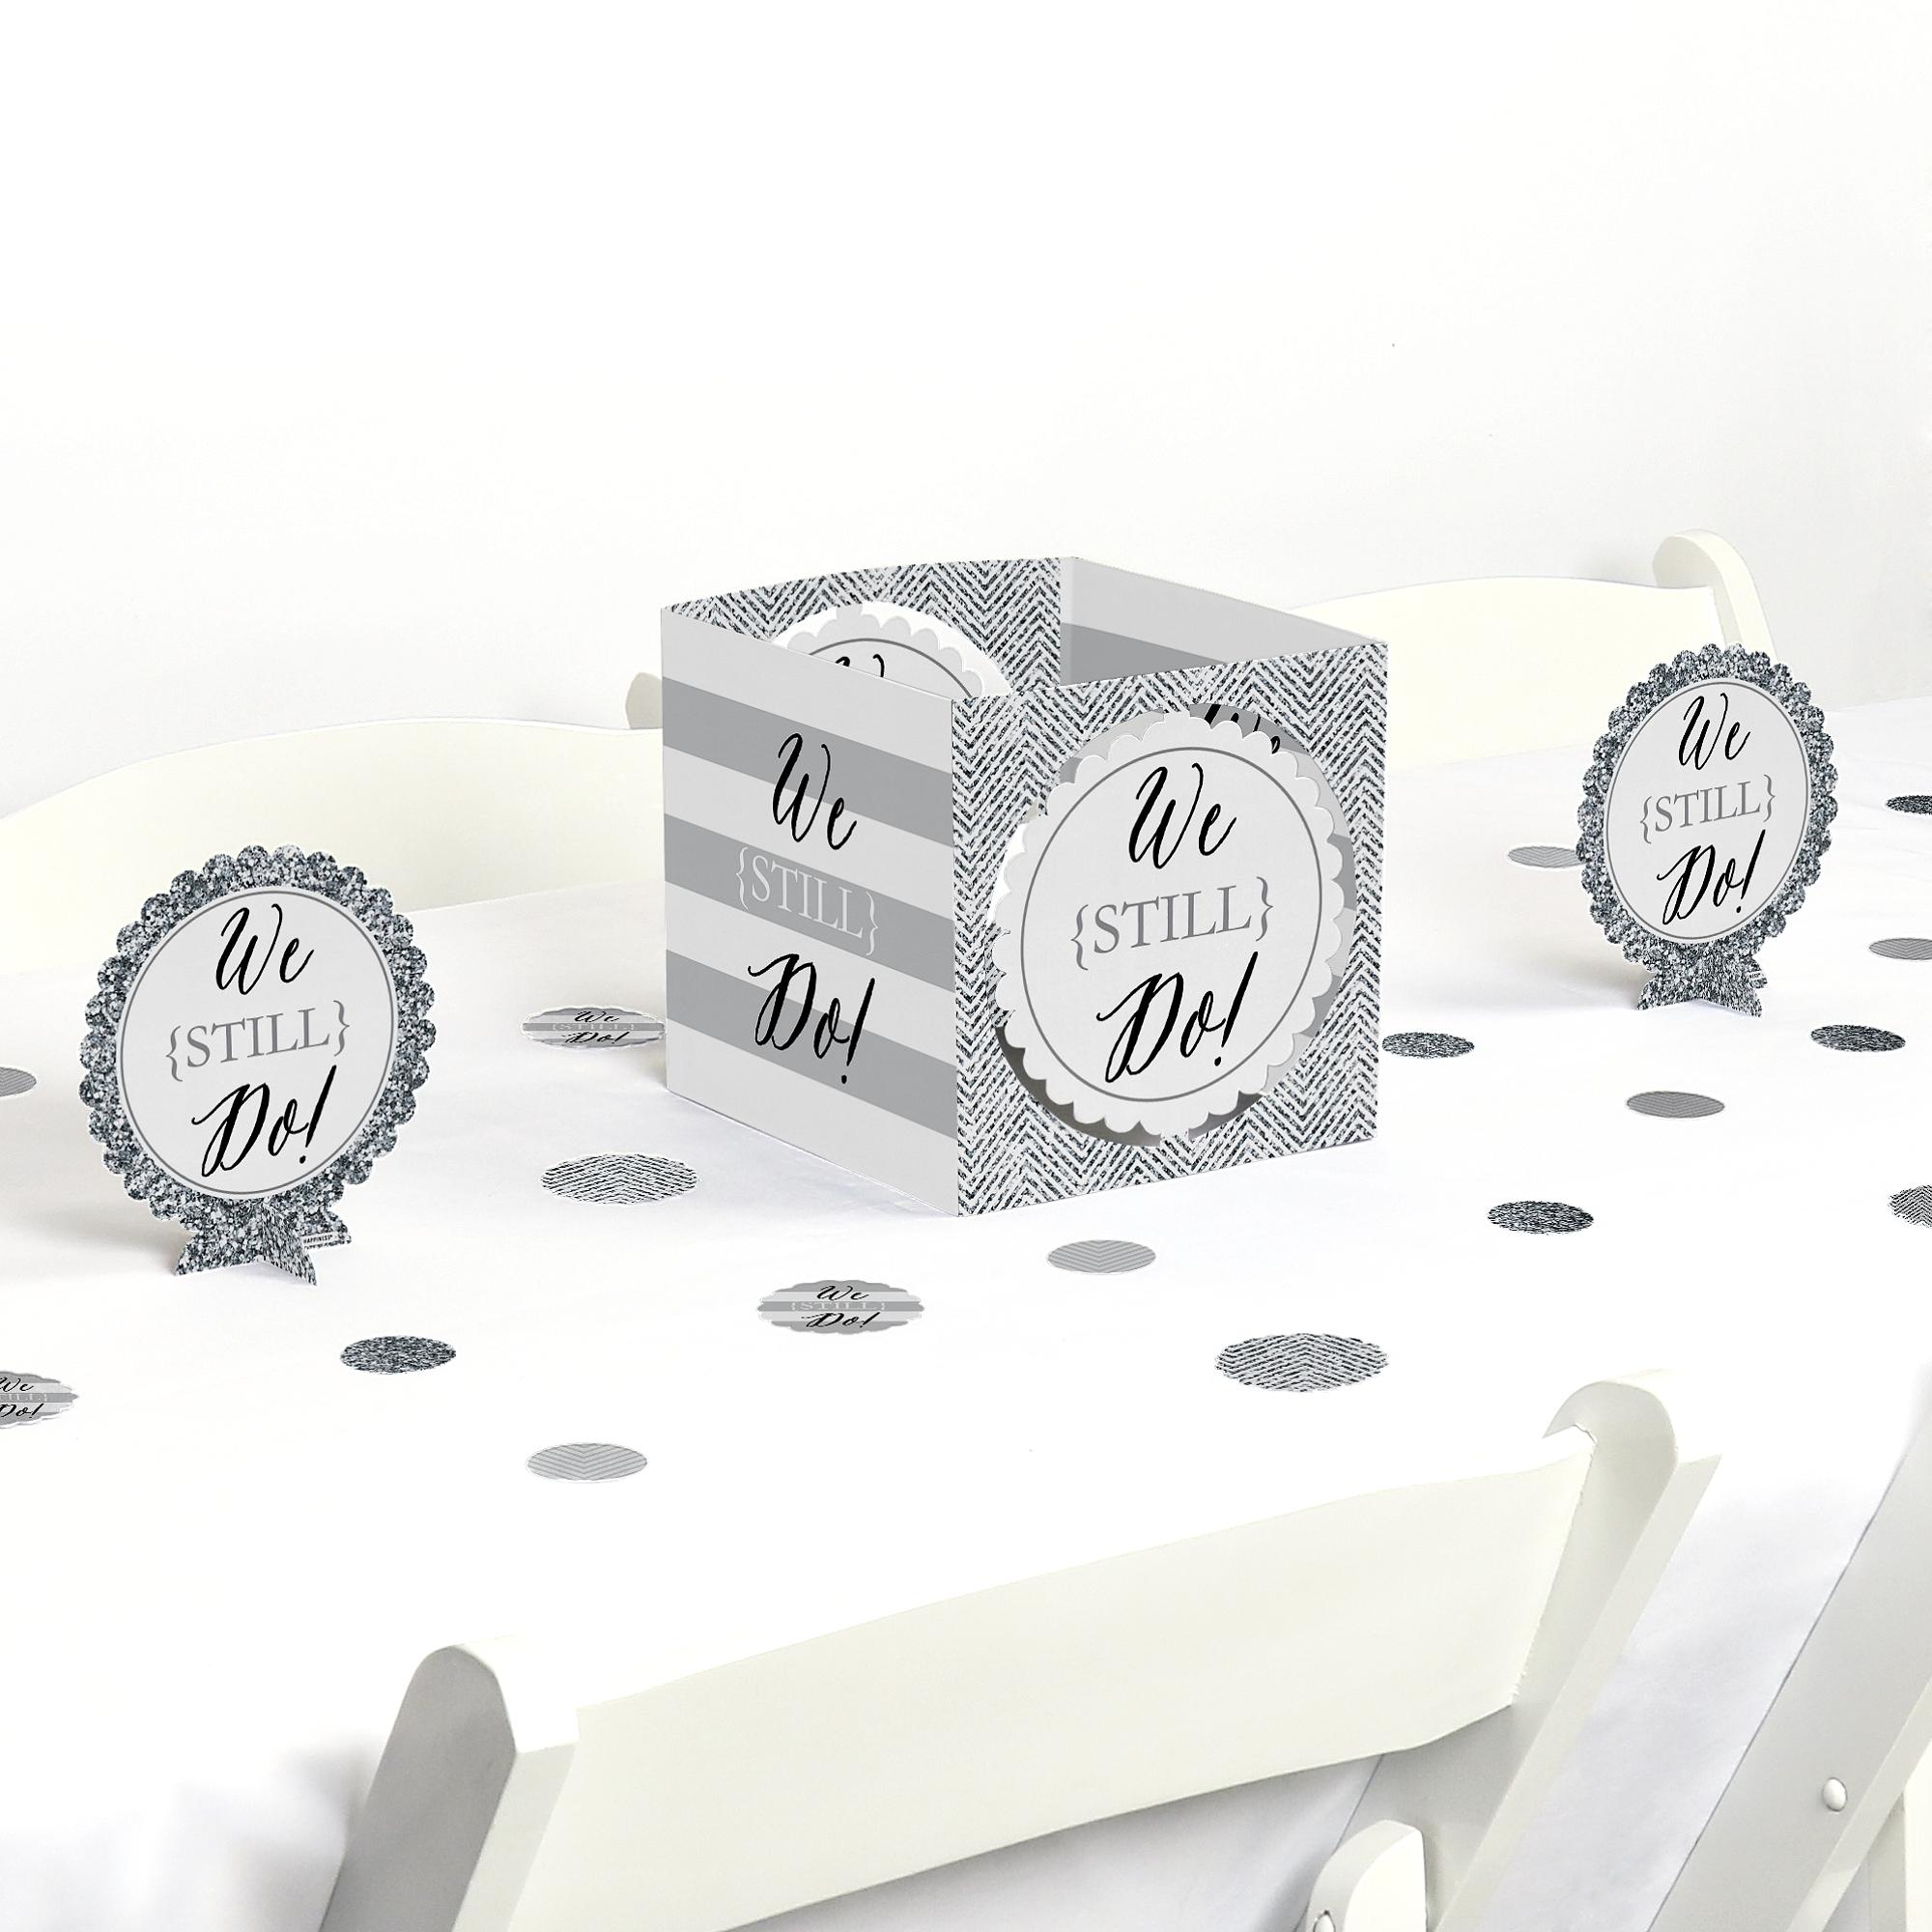 We Still Do - Wedding Anniversary - Party Centerpiece & Table Decoration Kit